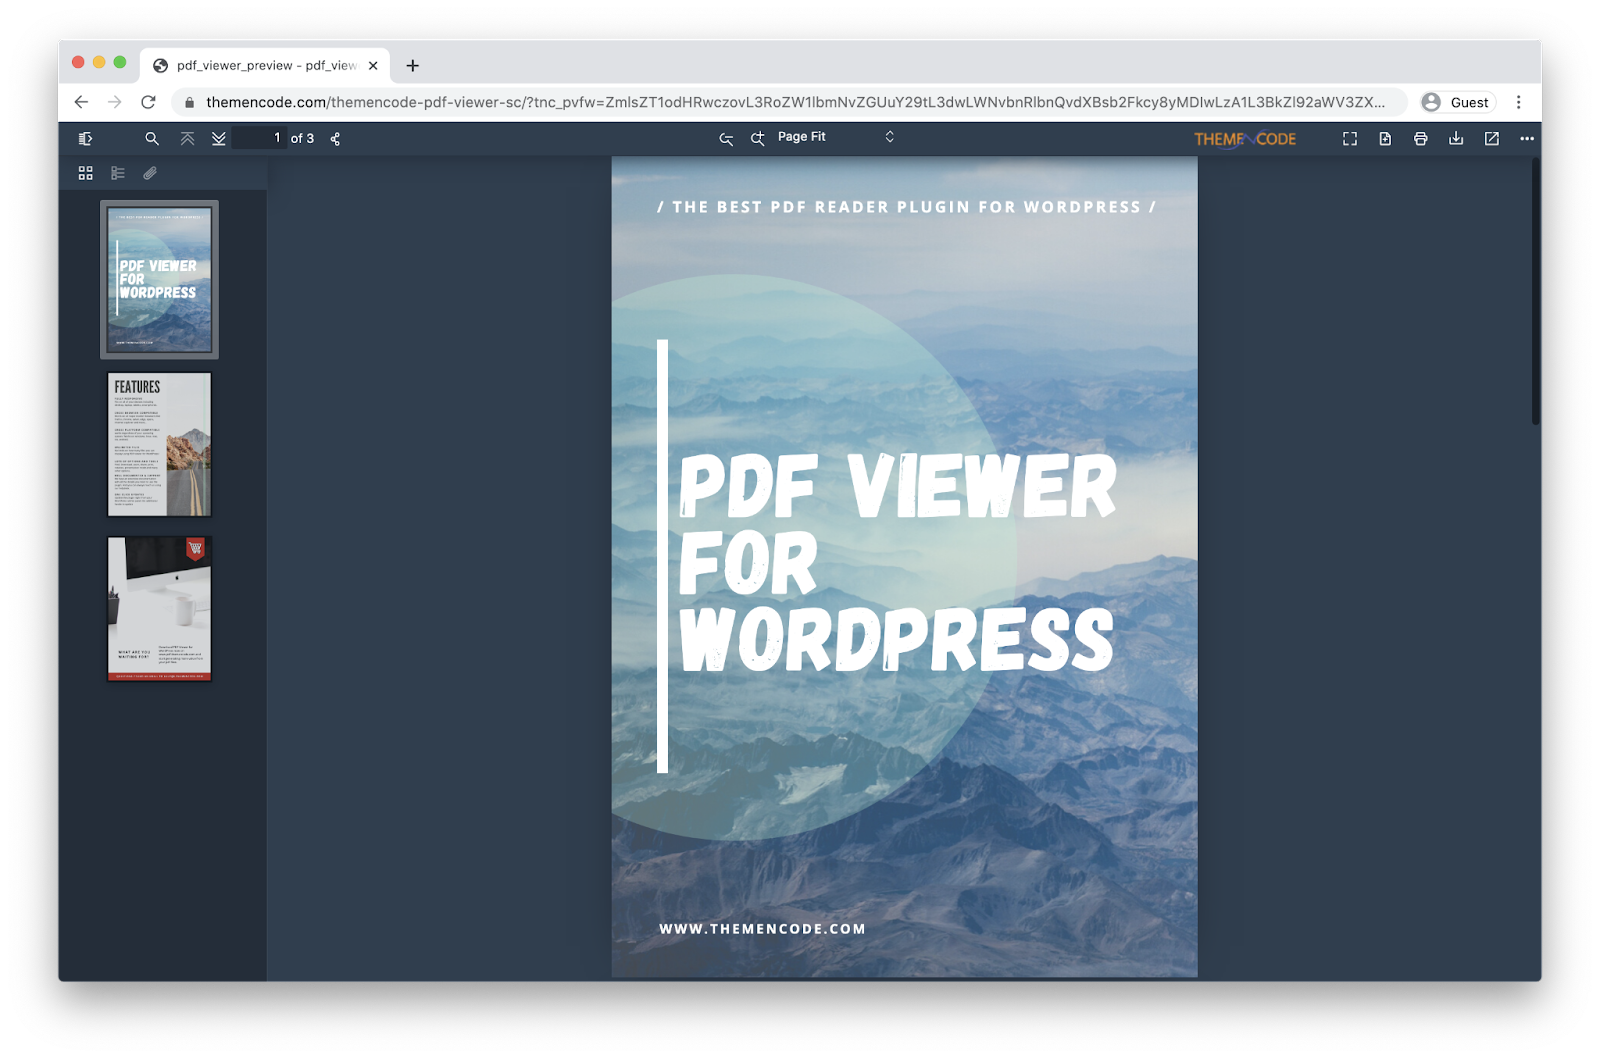 PDF viewer for wordpress download